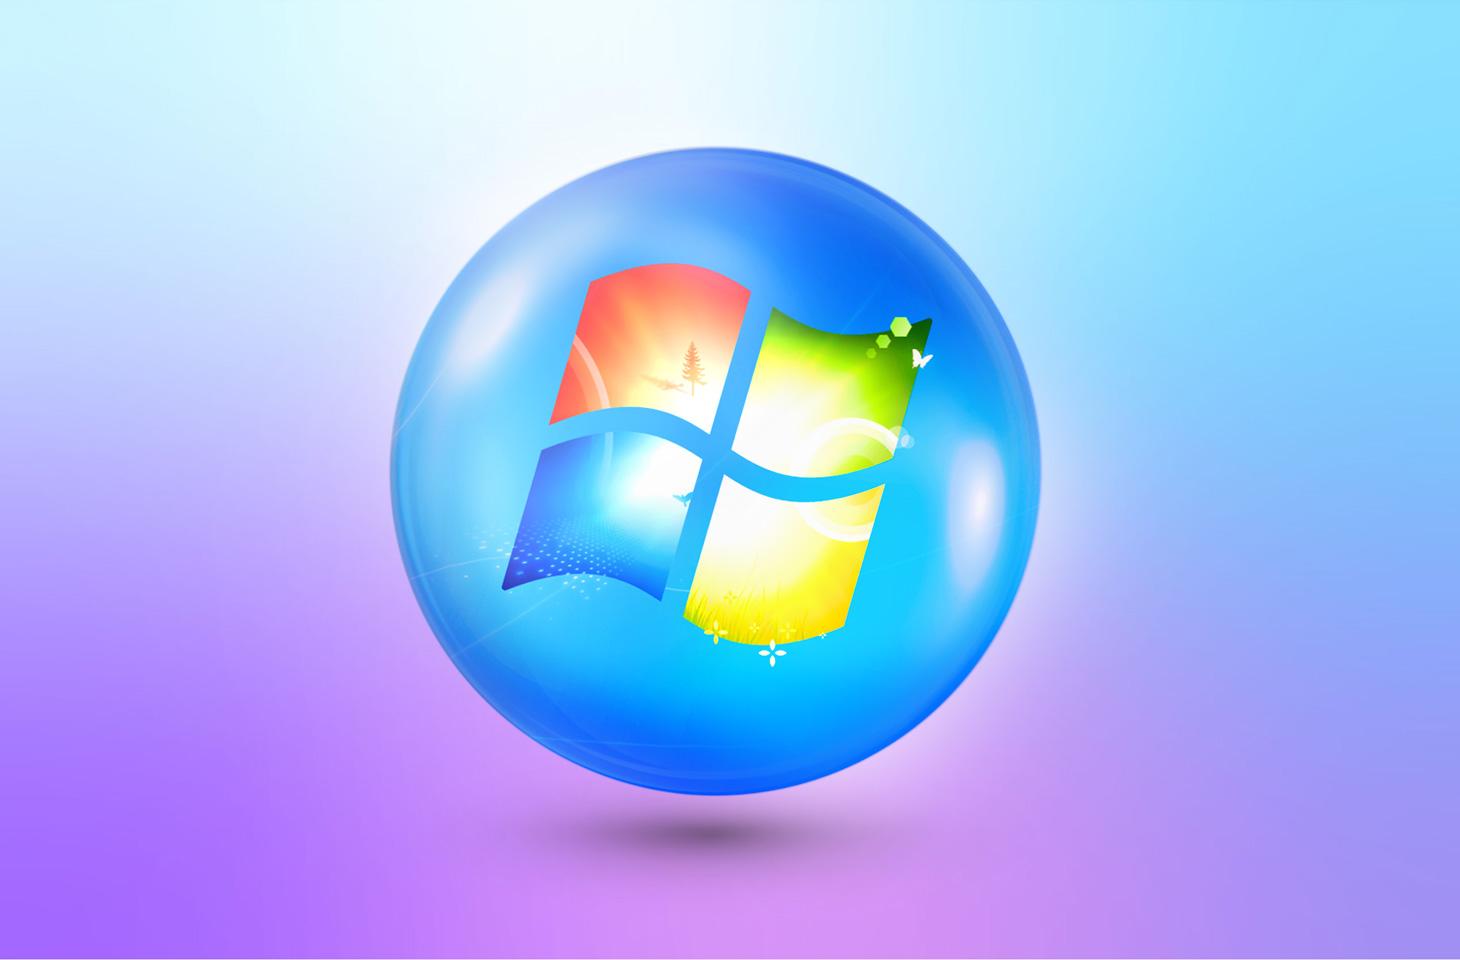 Windows 7 ha muerto: ¿Actualizar a Windows 10?